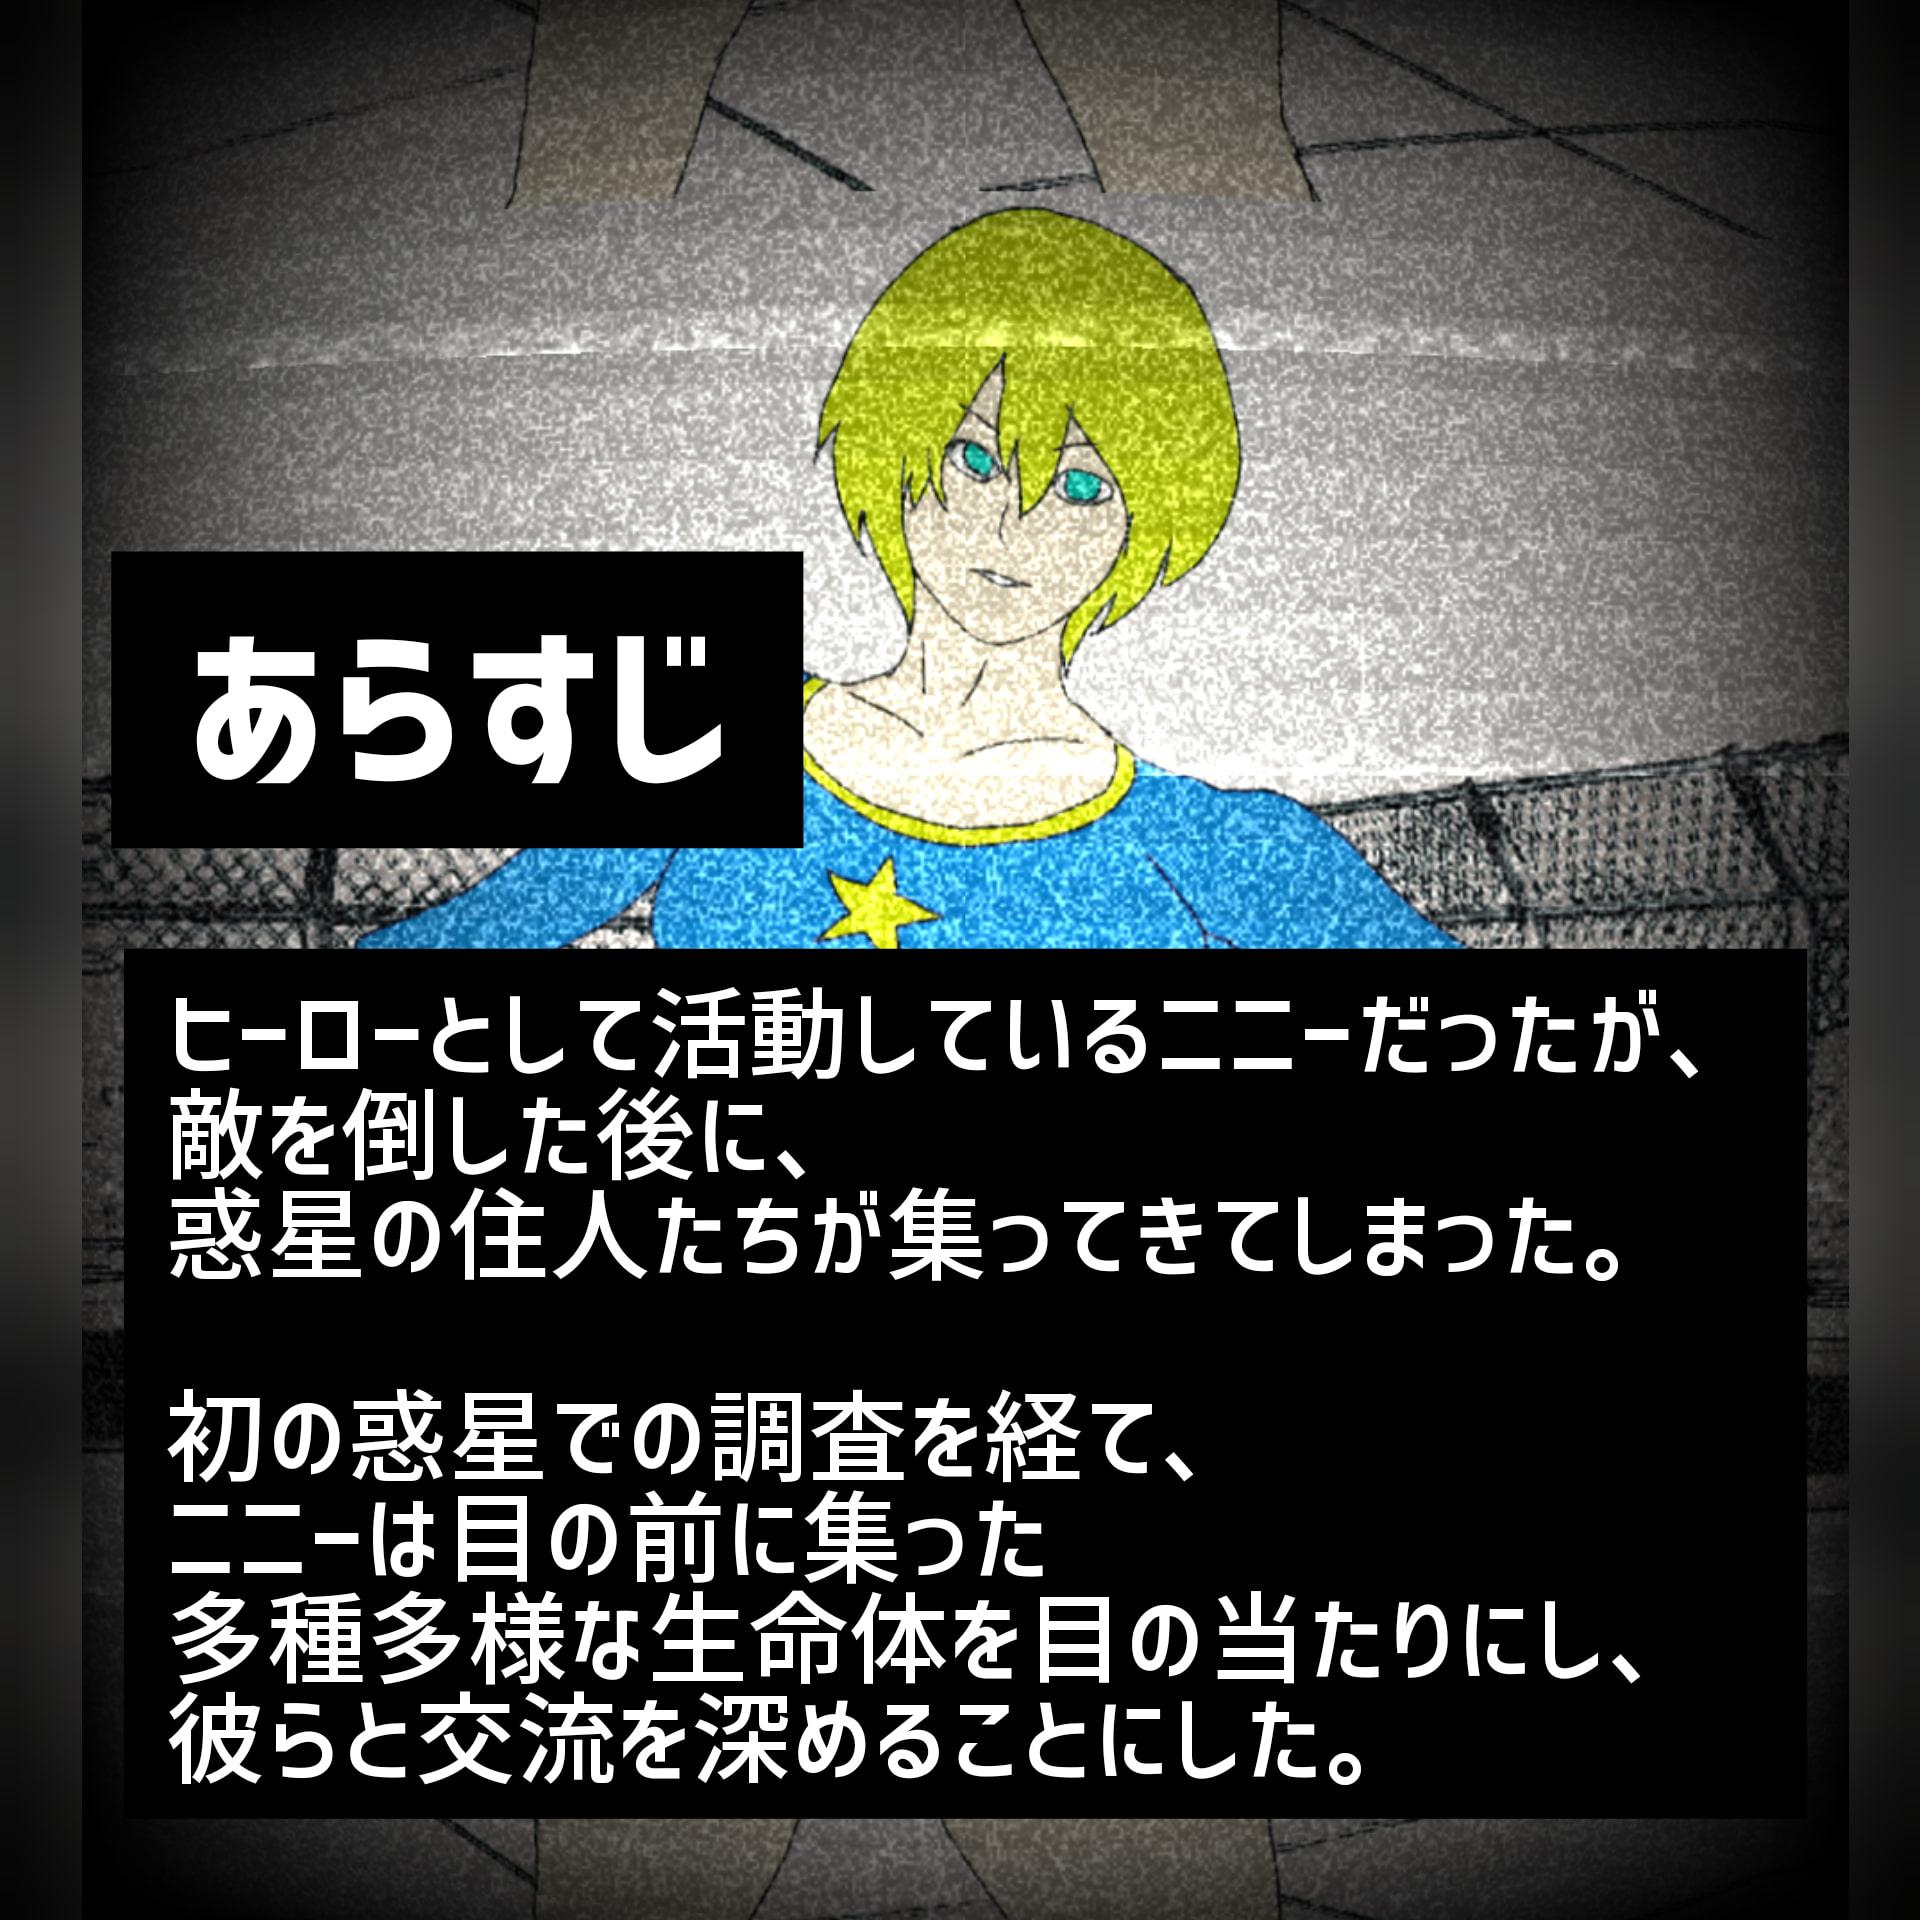 RJ320730 正義のヒロインのファン包容力試し~Snake Polite with Ninny [20210315]